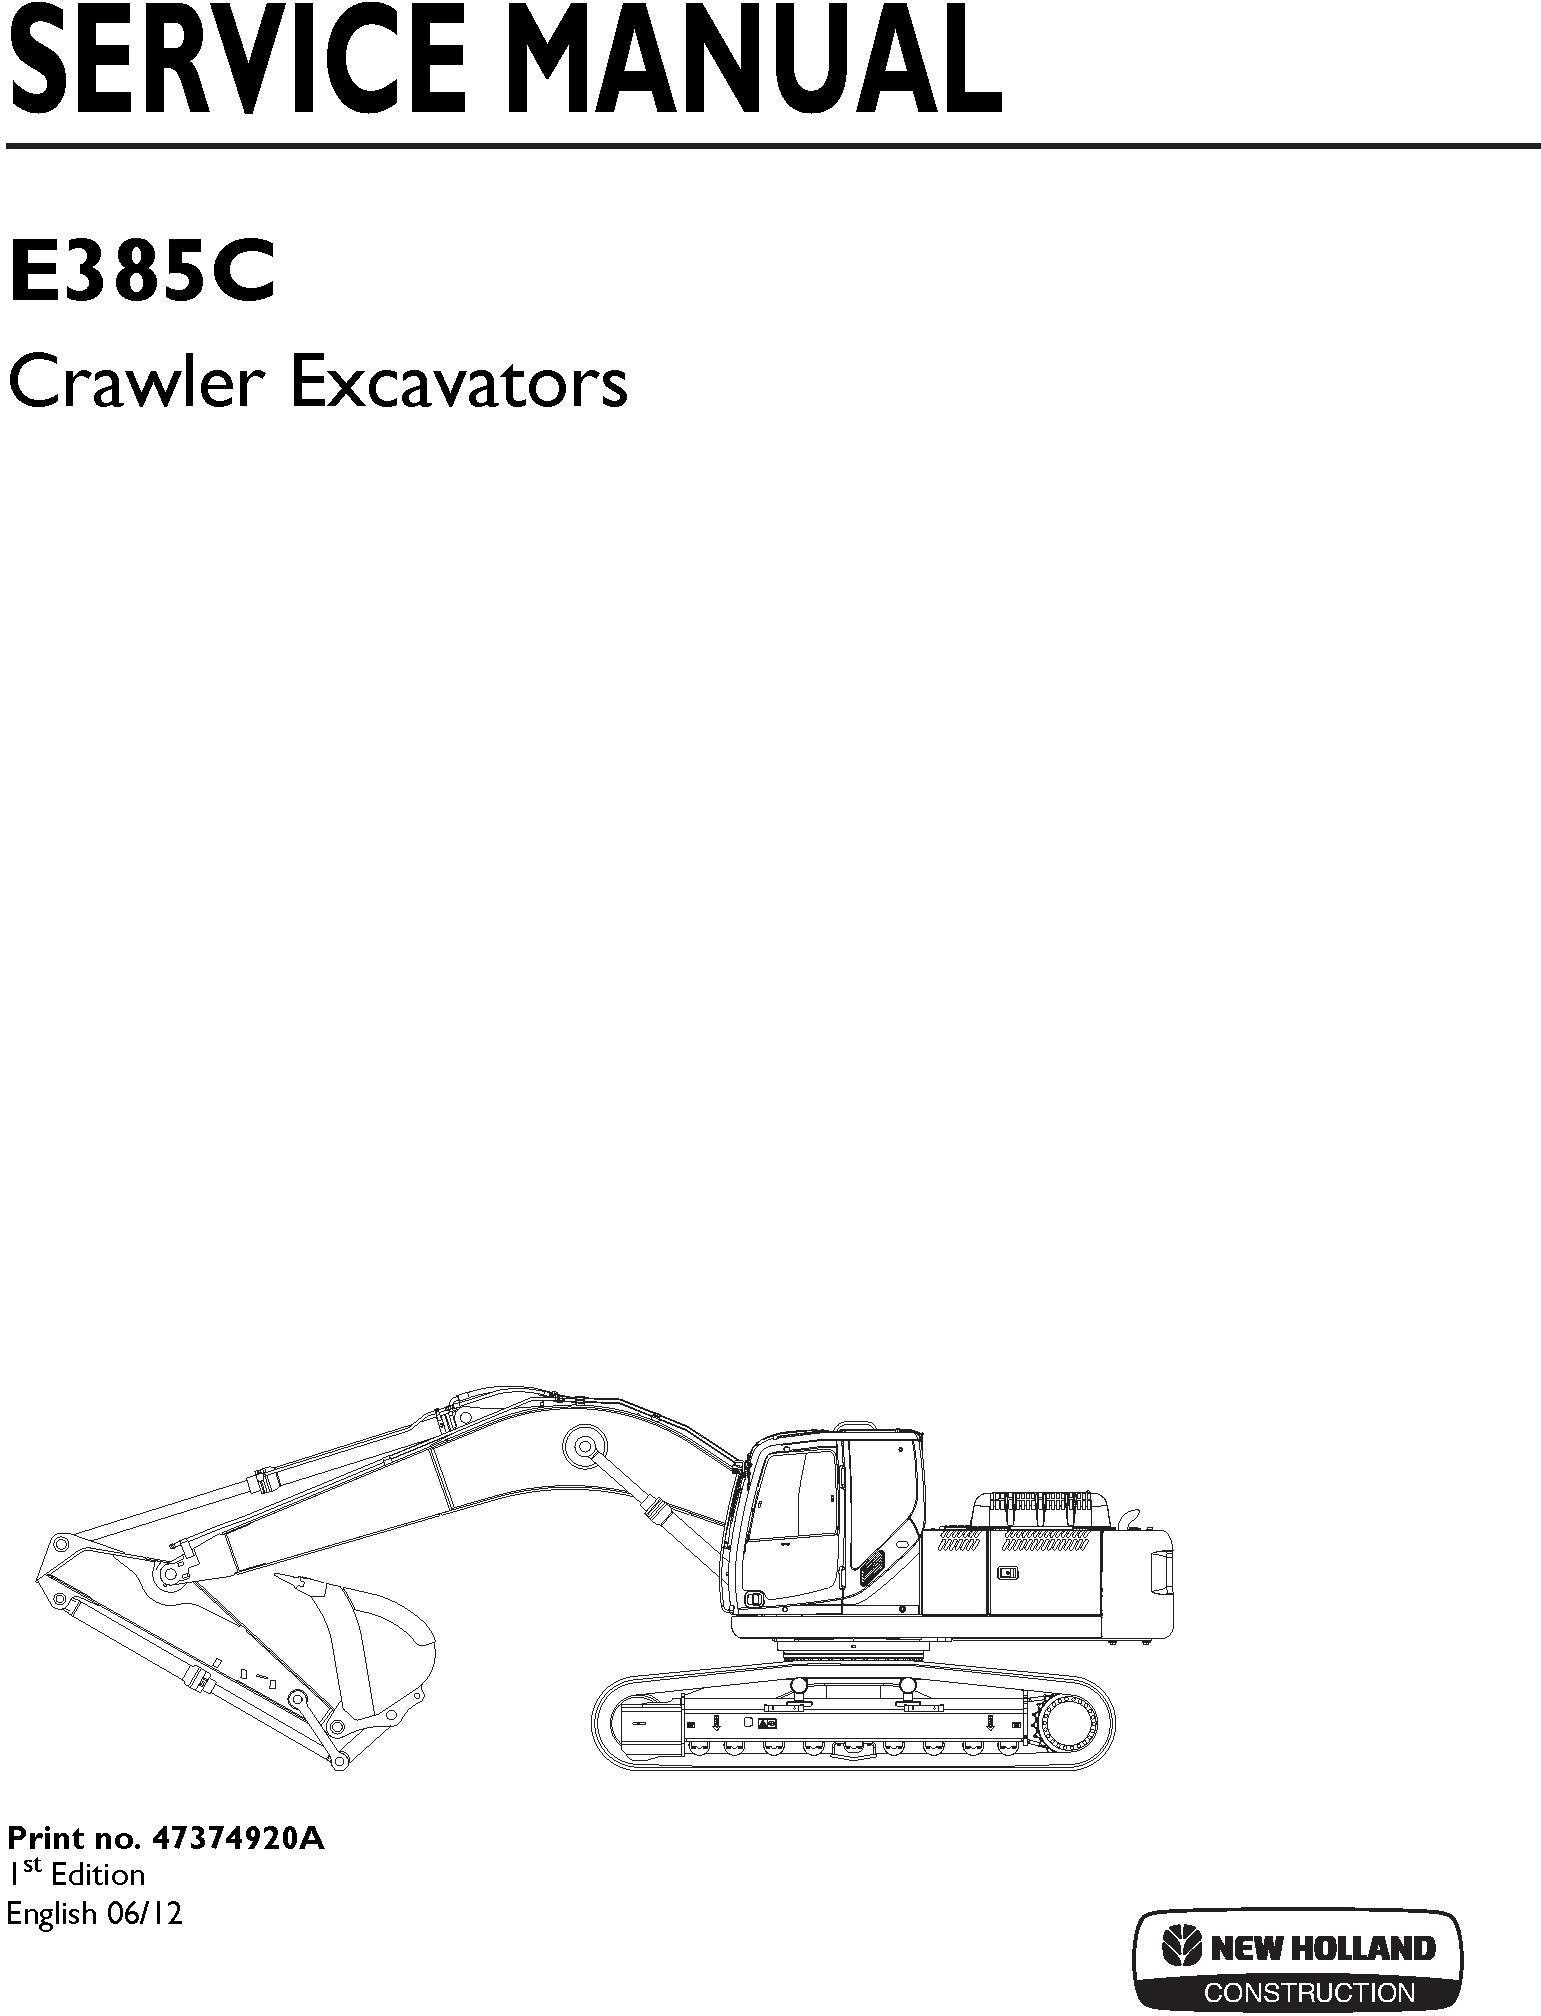 New Holland E385C Crawler Excavator Service Manual / Truck